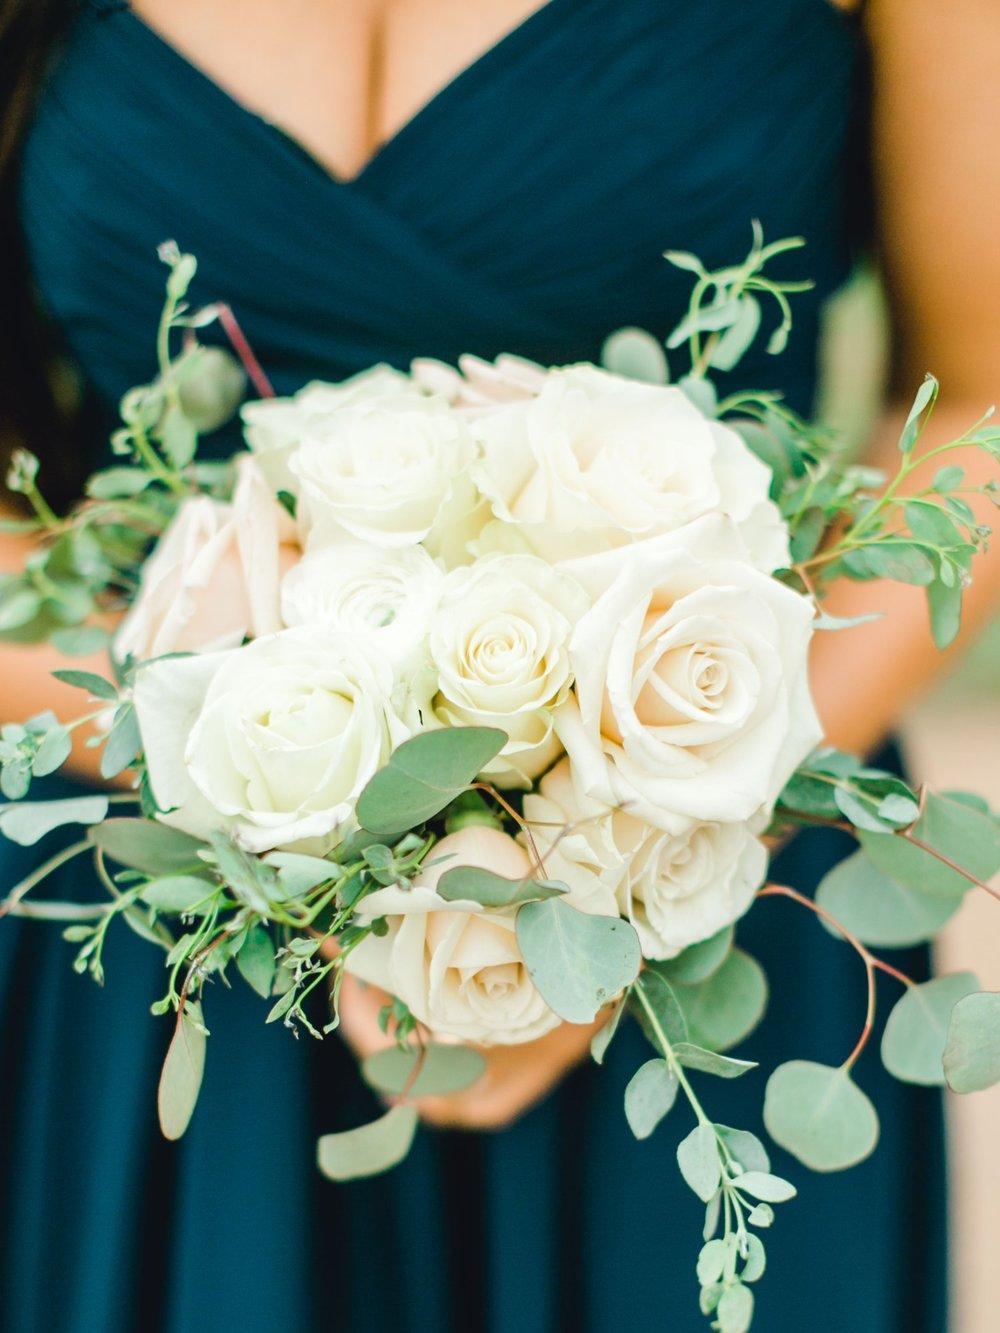 Ashley_John_English_Elegant_Texas_Wedding_Outdoors_Ranch_Caprock_Winery_ALLEEJ_0046.jpg